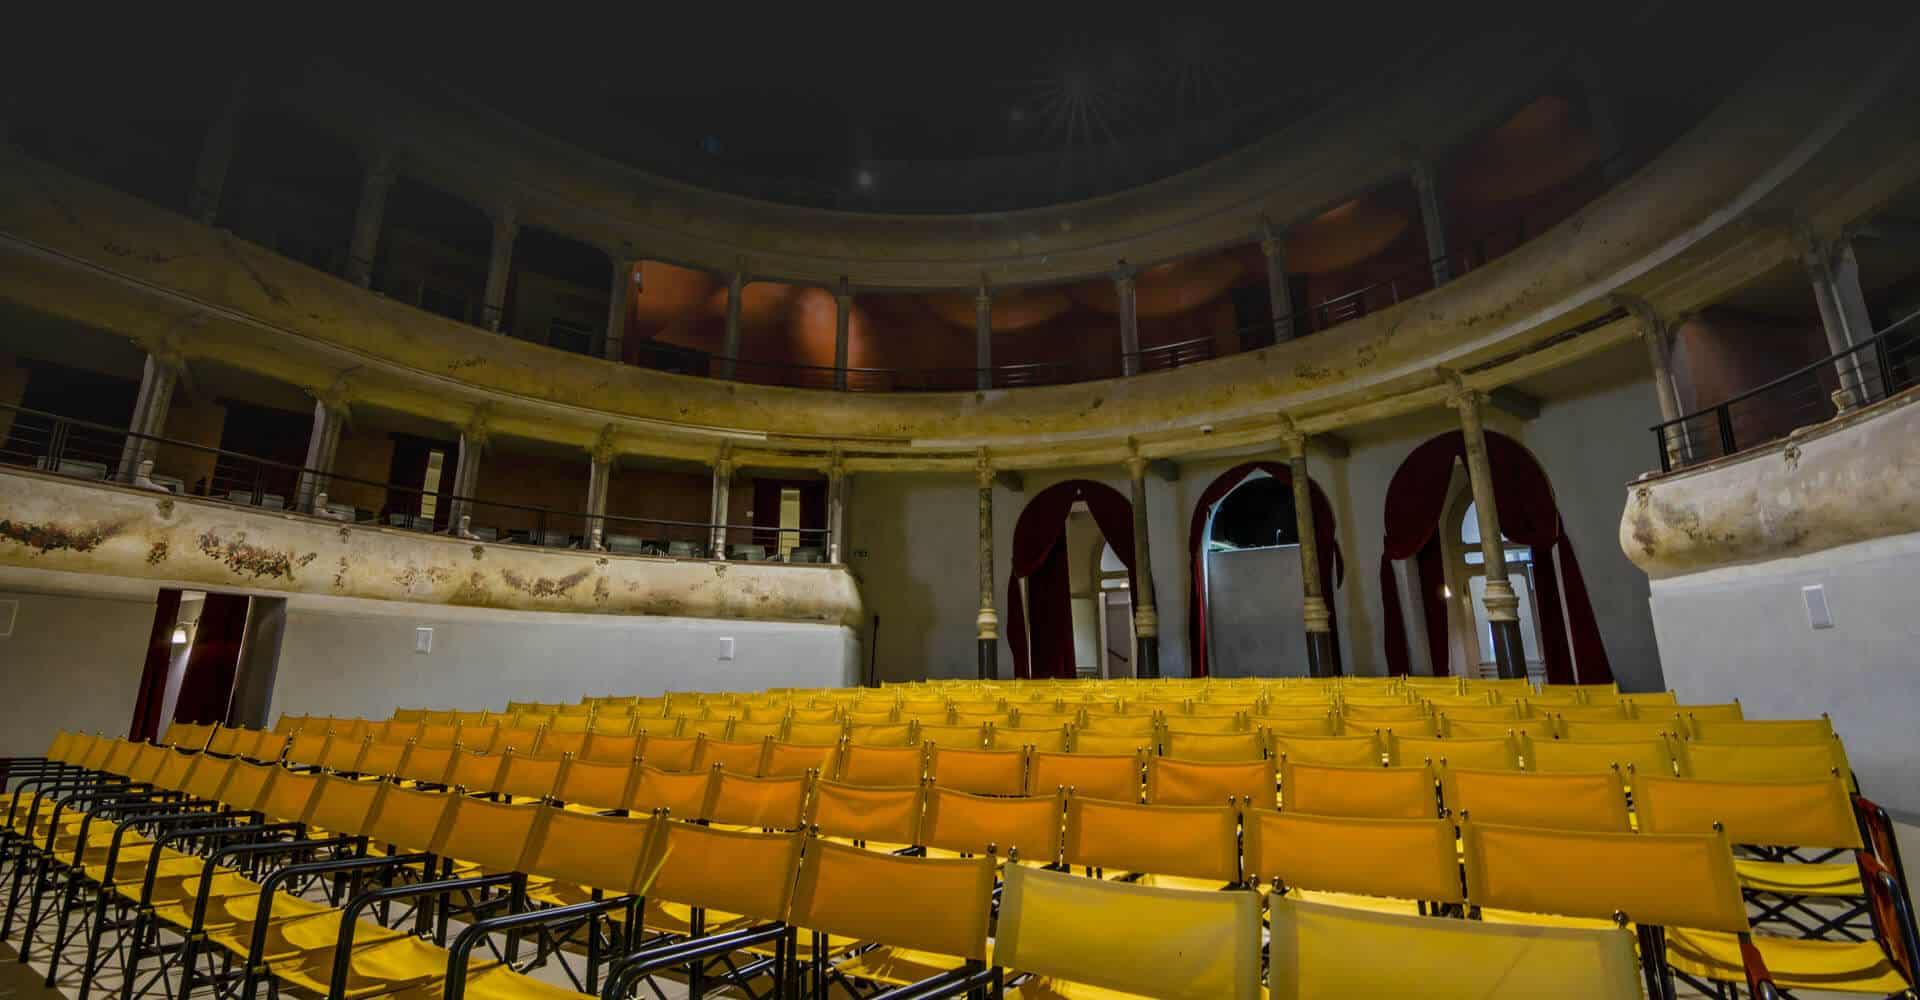 Restauro Teatro Civico Schio Vicenza